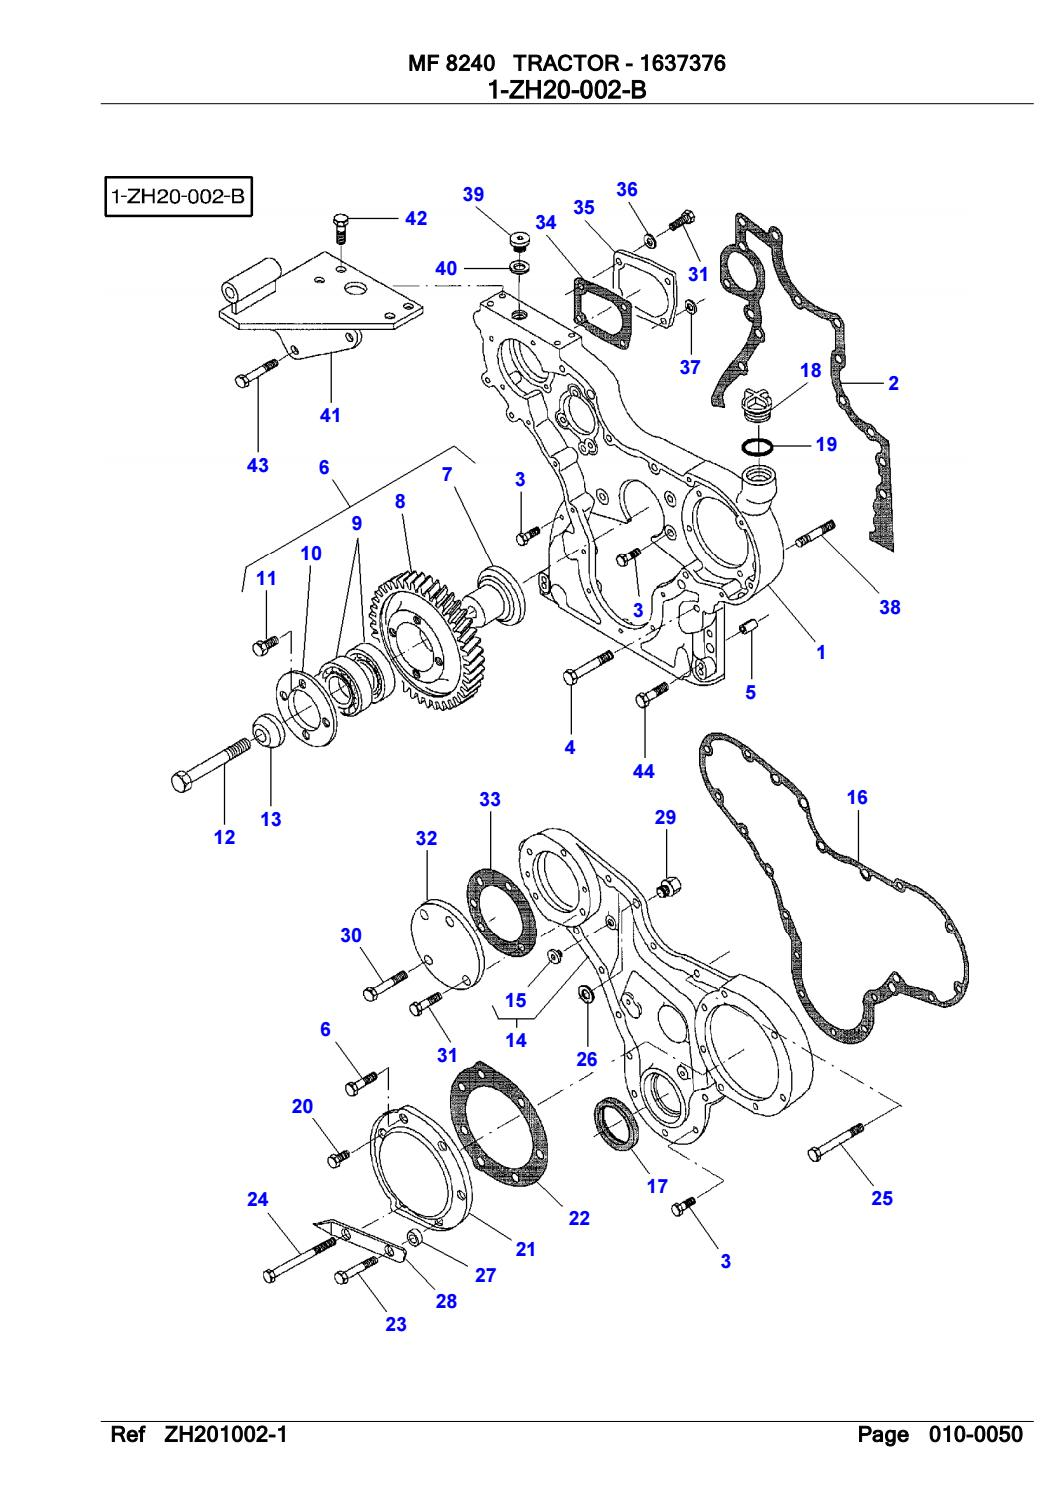 Massey Ferguson MF8240 TRACTOR Parts Catalogue Manual by